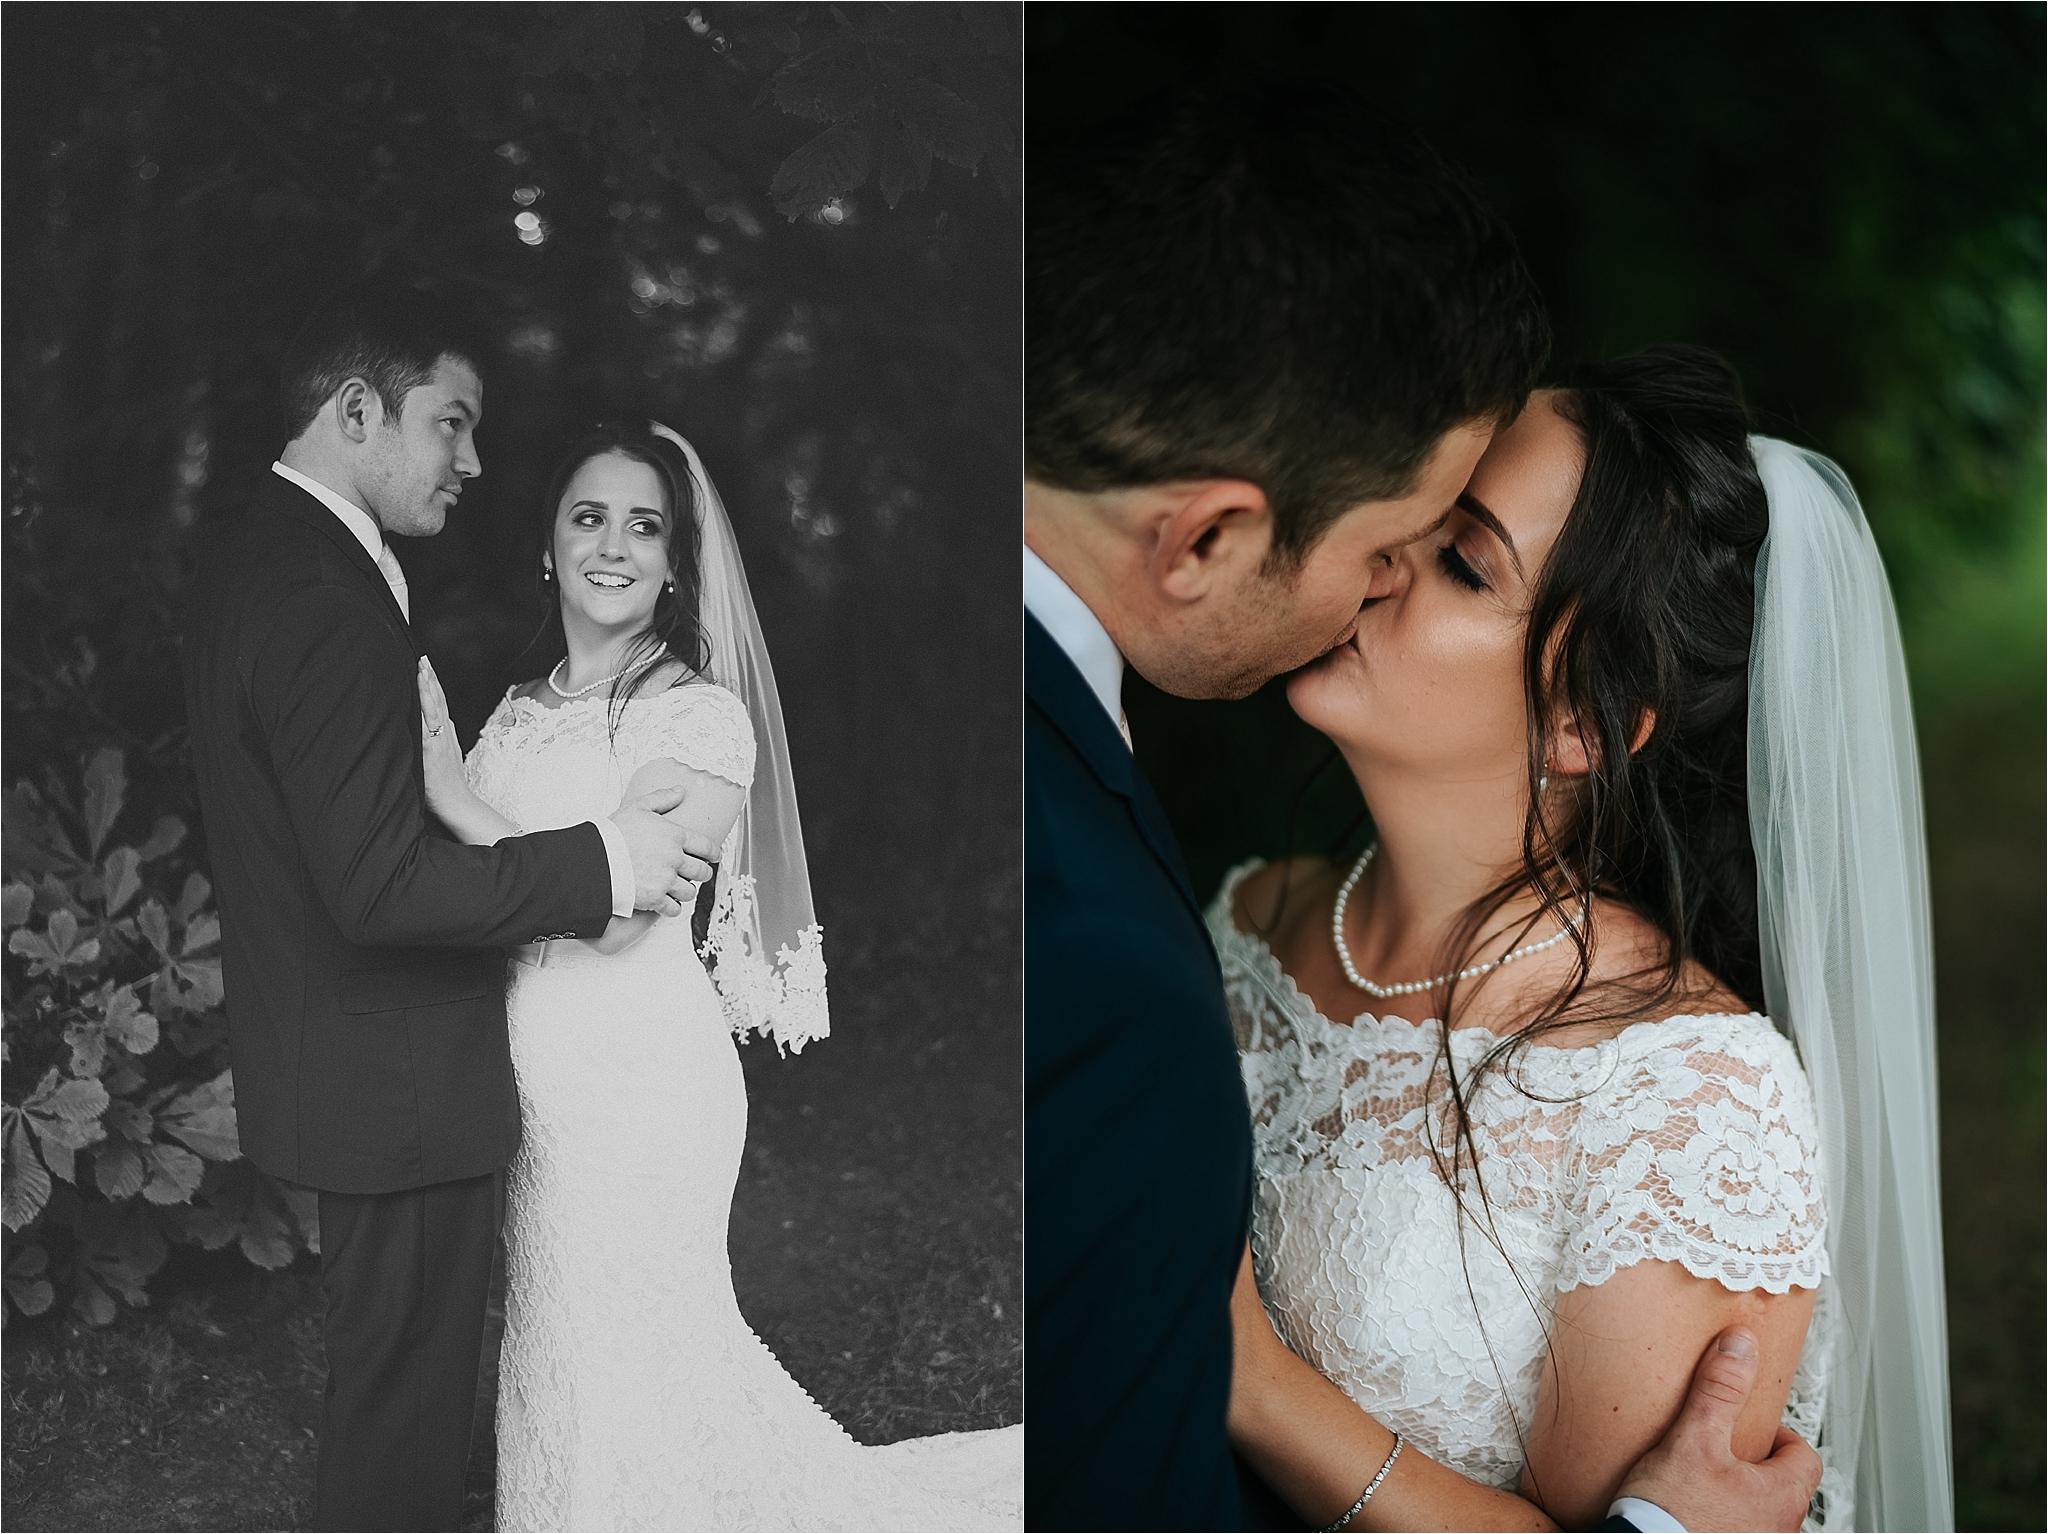 thevilla+lancashire+wreagreen+wedding+photographer39.jpg